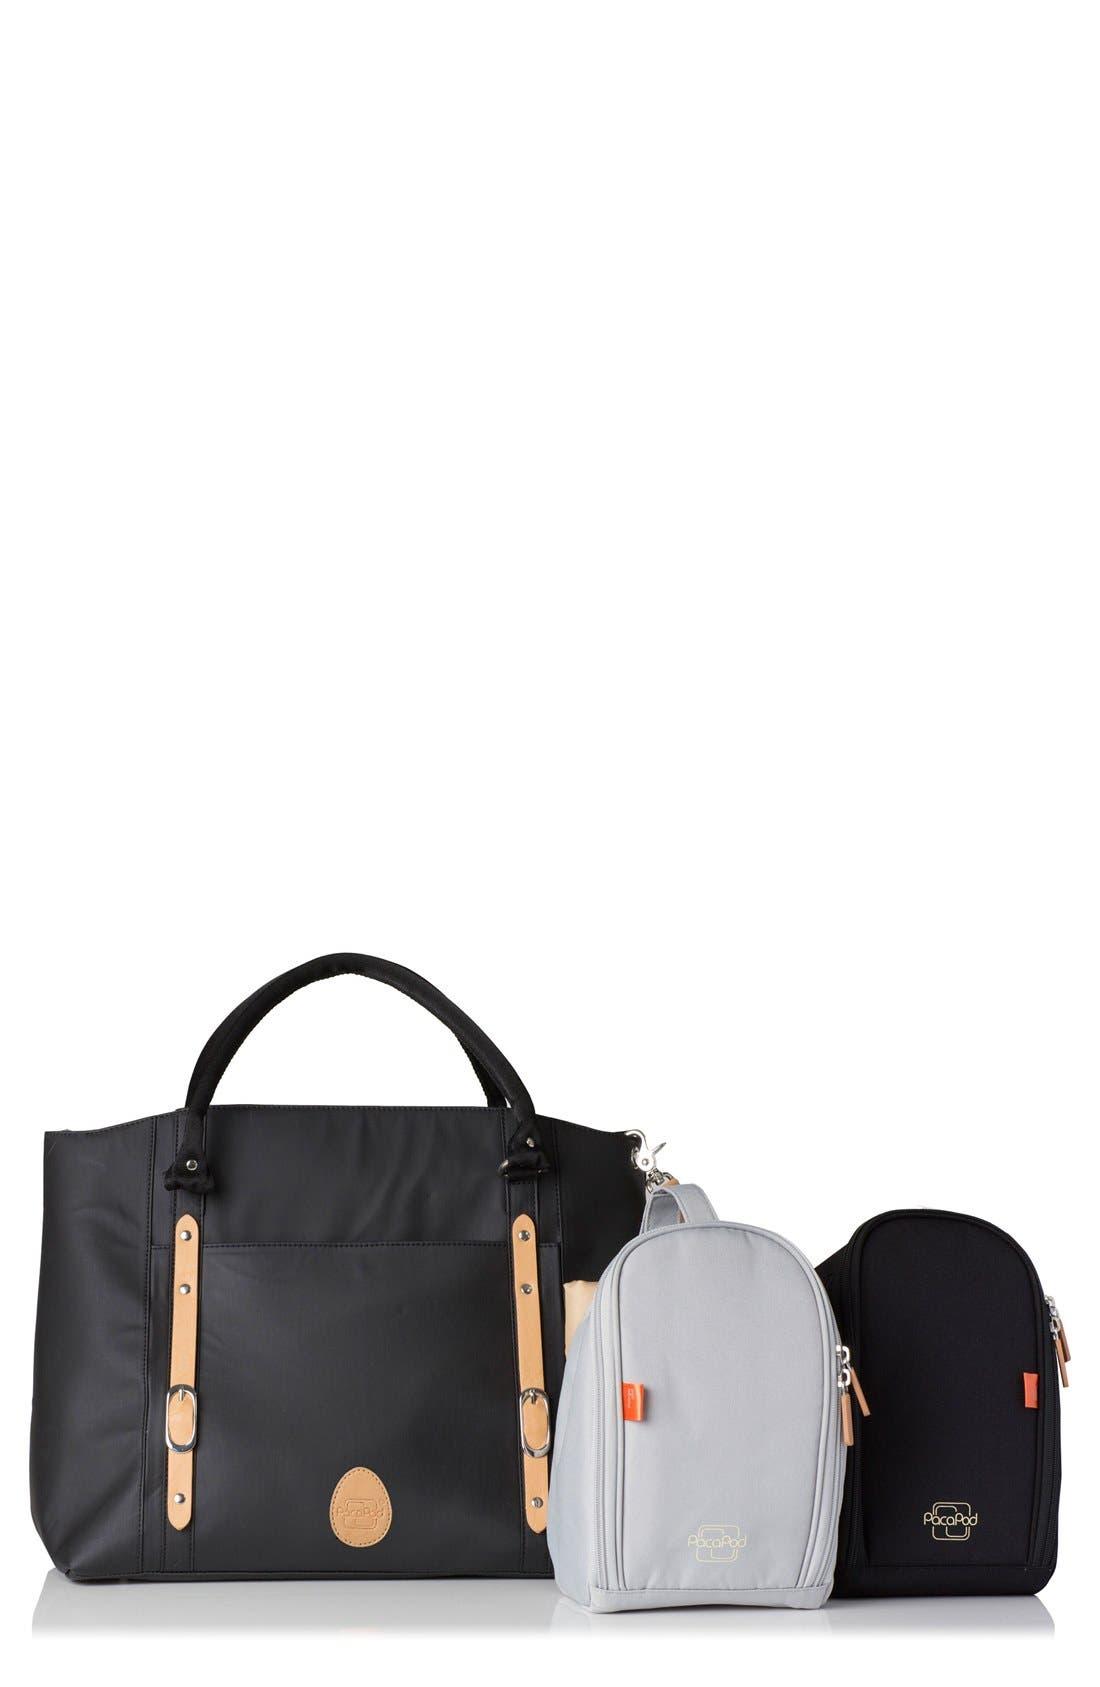 'Mirano' Diaper Bag,                             Alternate thumbnail 7, color,                             Black